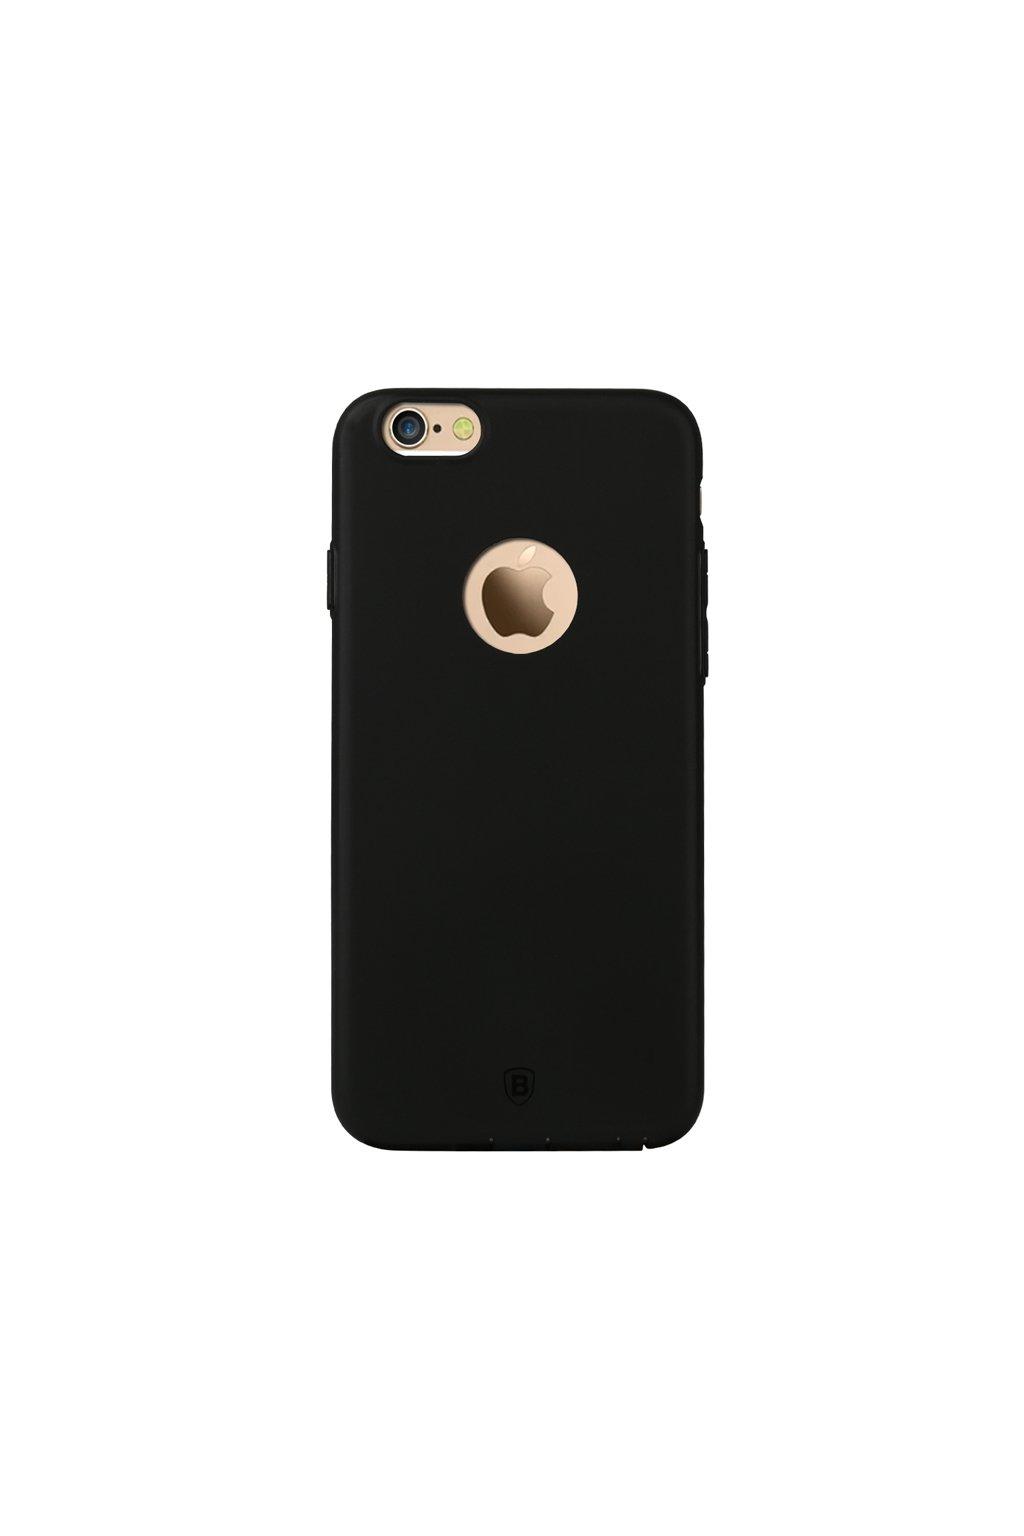 Pouzdro Apple iPhone 6/6S Baseus TPU Mousse, black